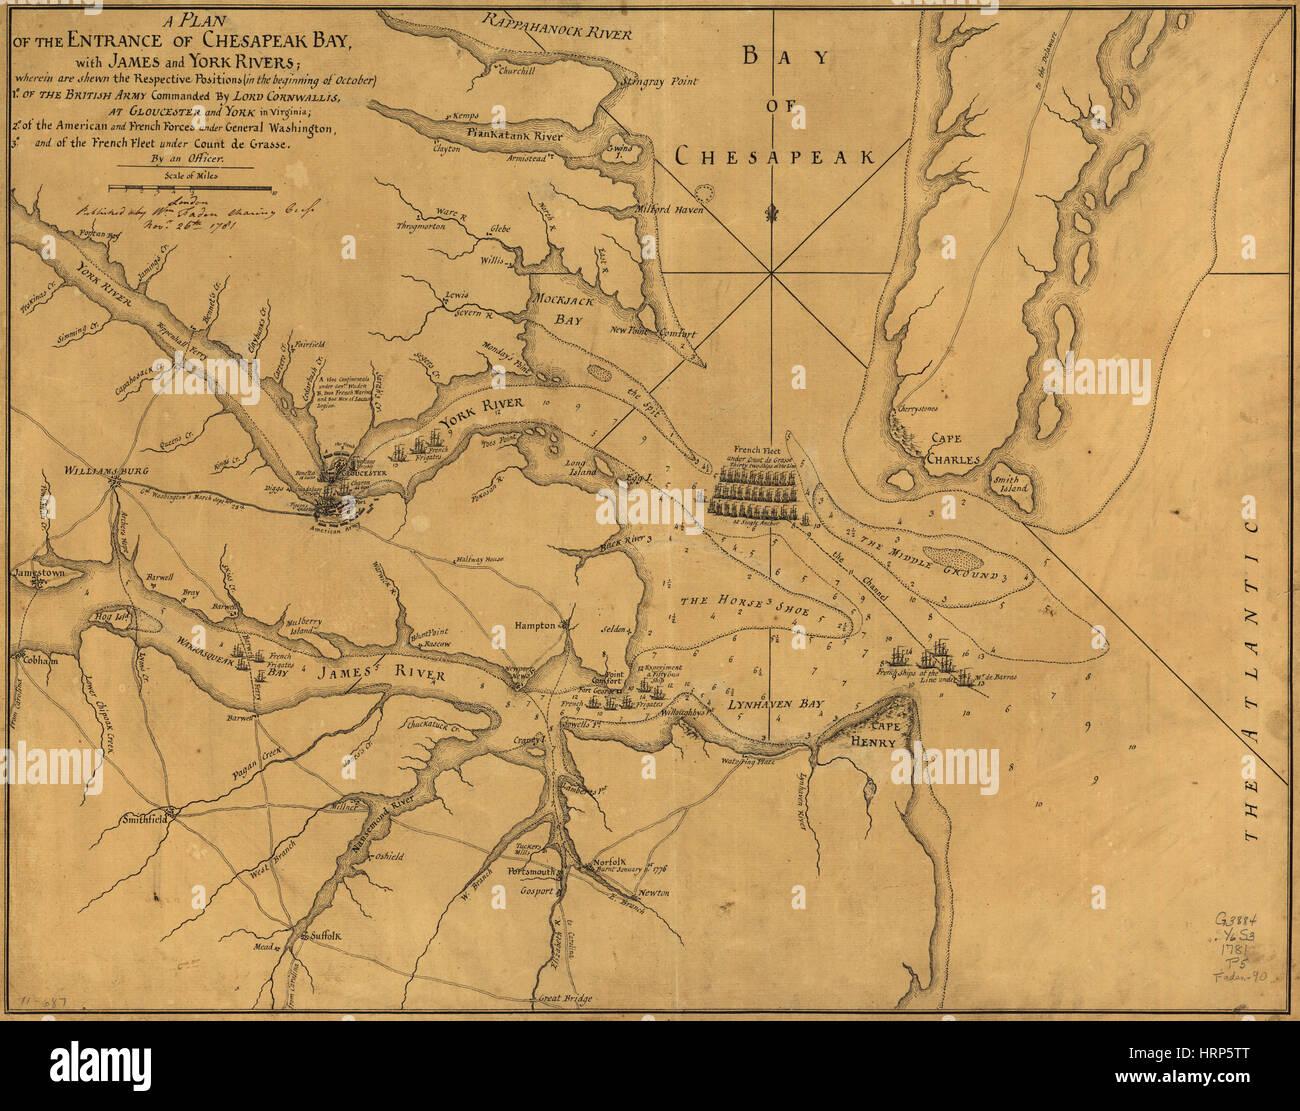 Battle Positions, Siege of Yorktown - Stock Image